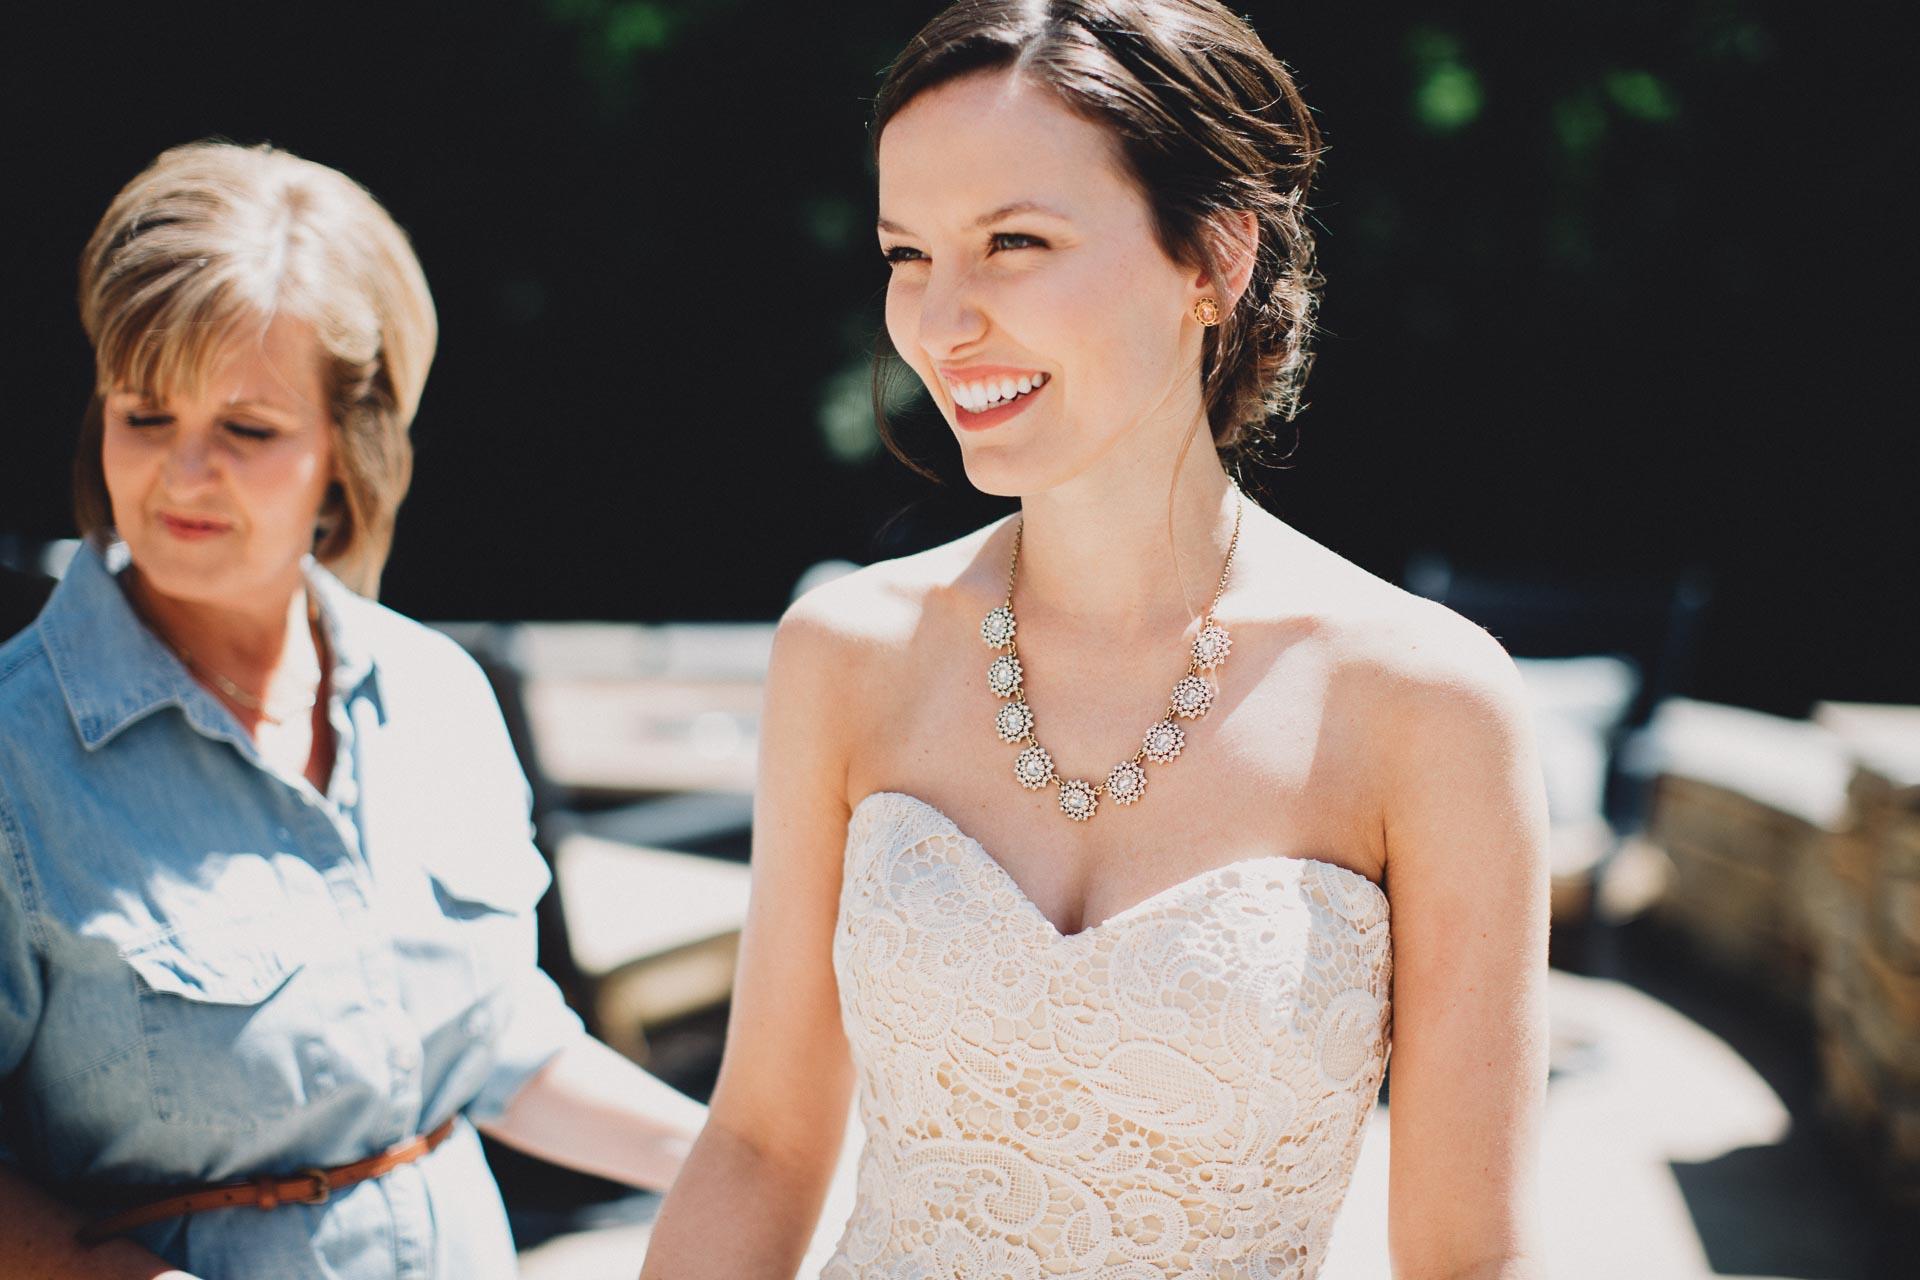 Julia-Michael-Cincinnati-Music-Hall-Wedding-025@2x.jpg